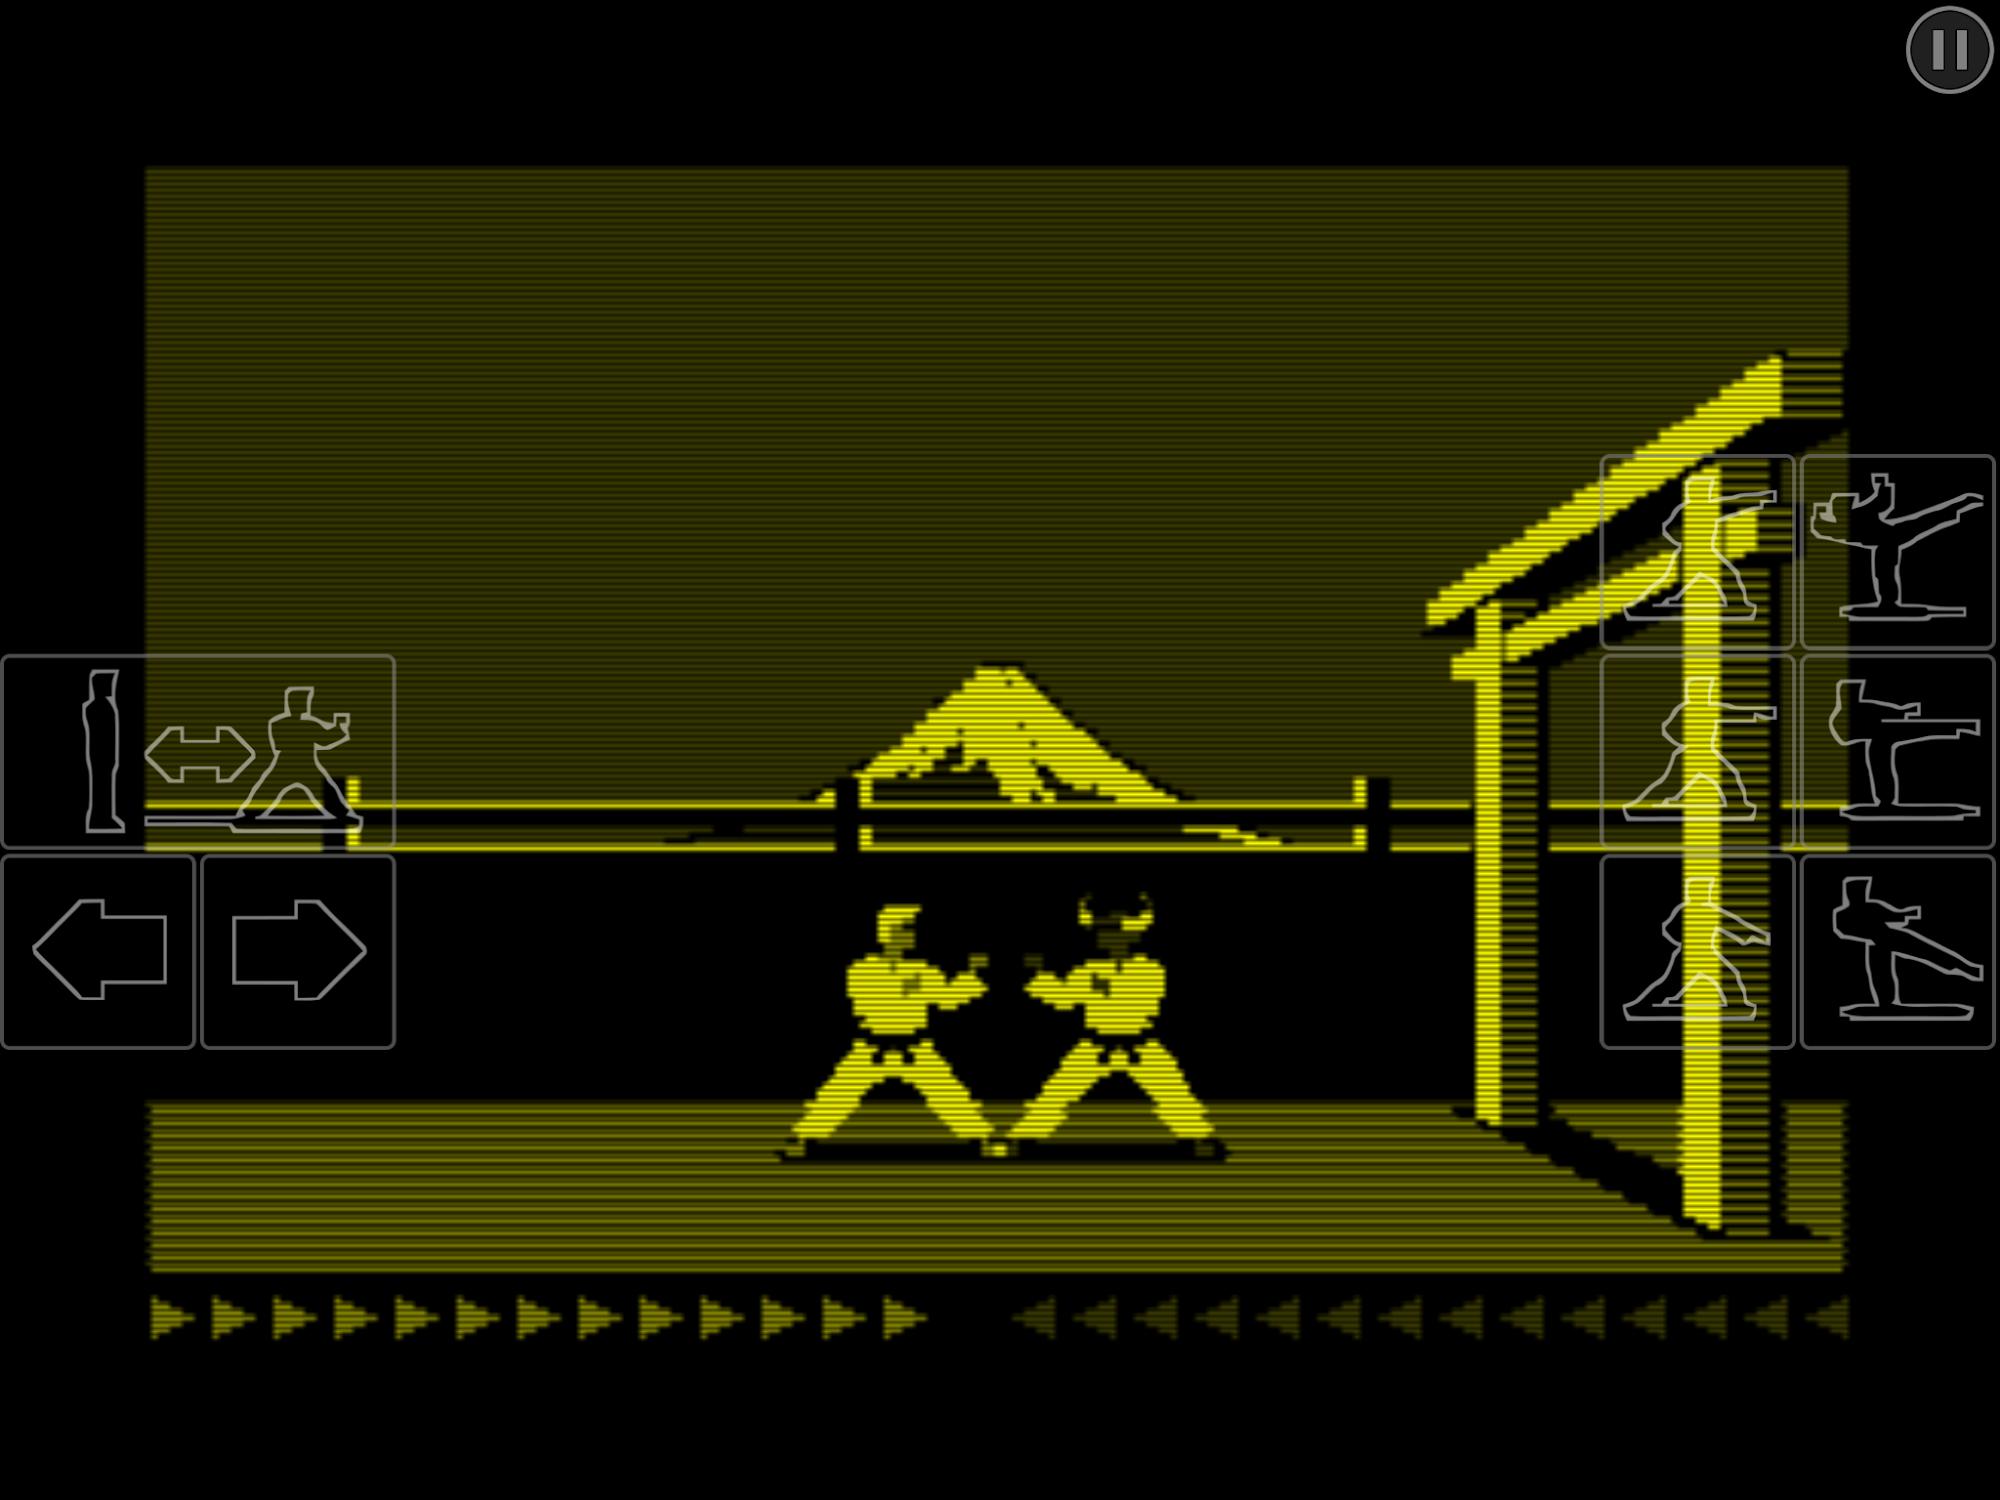 Karateka Classic screenshot #7